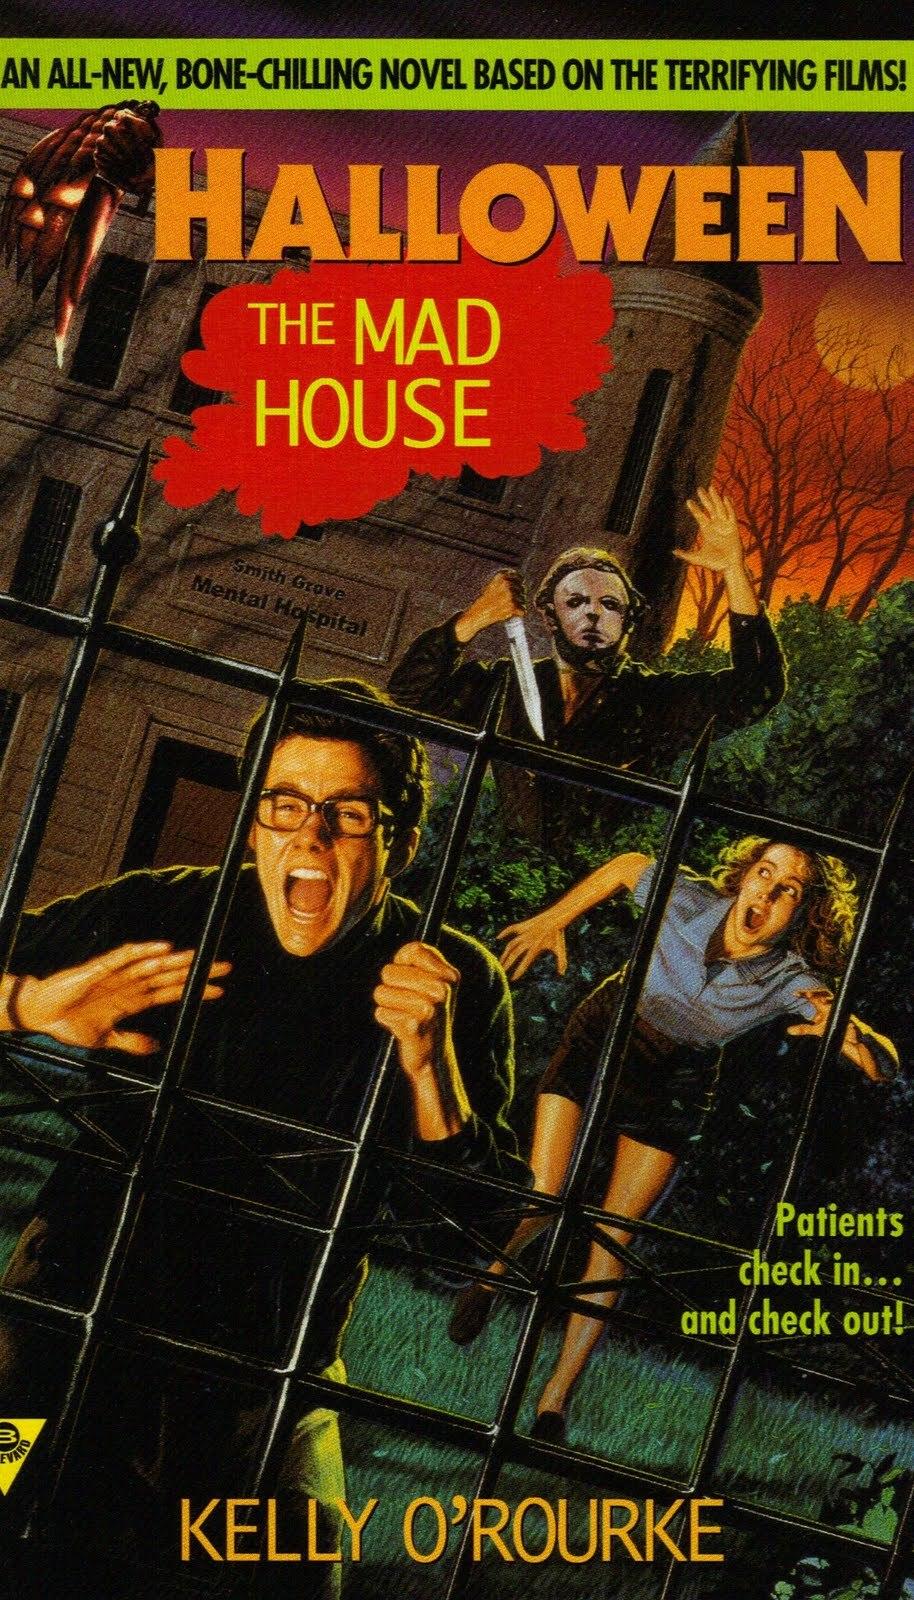 Halloween The Mad House.jpg